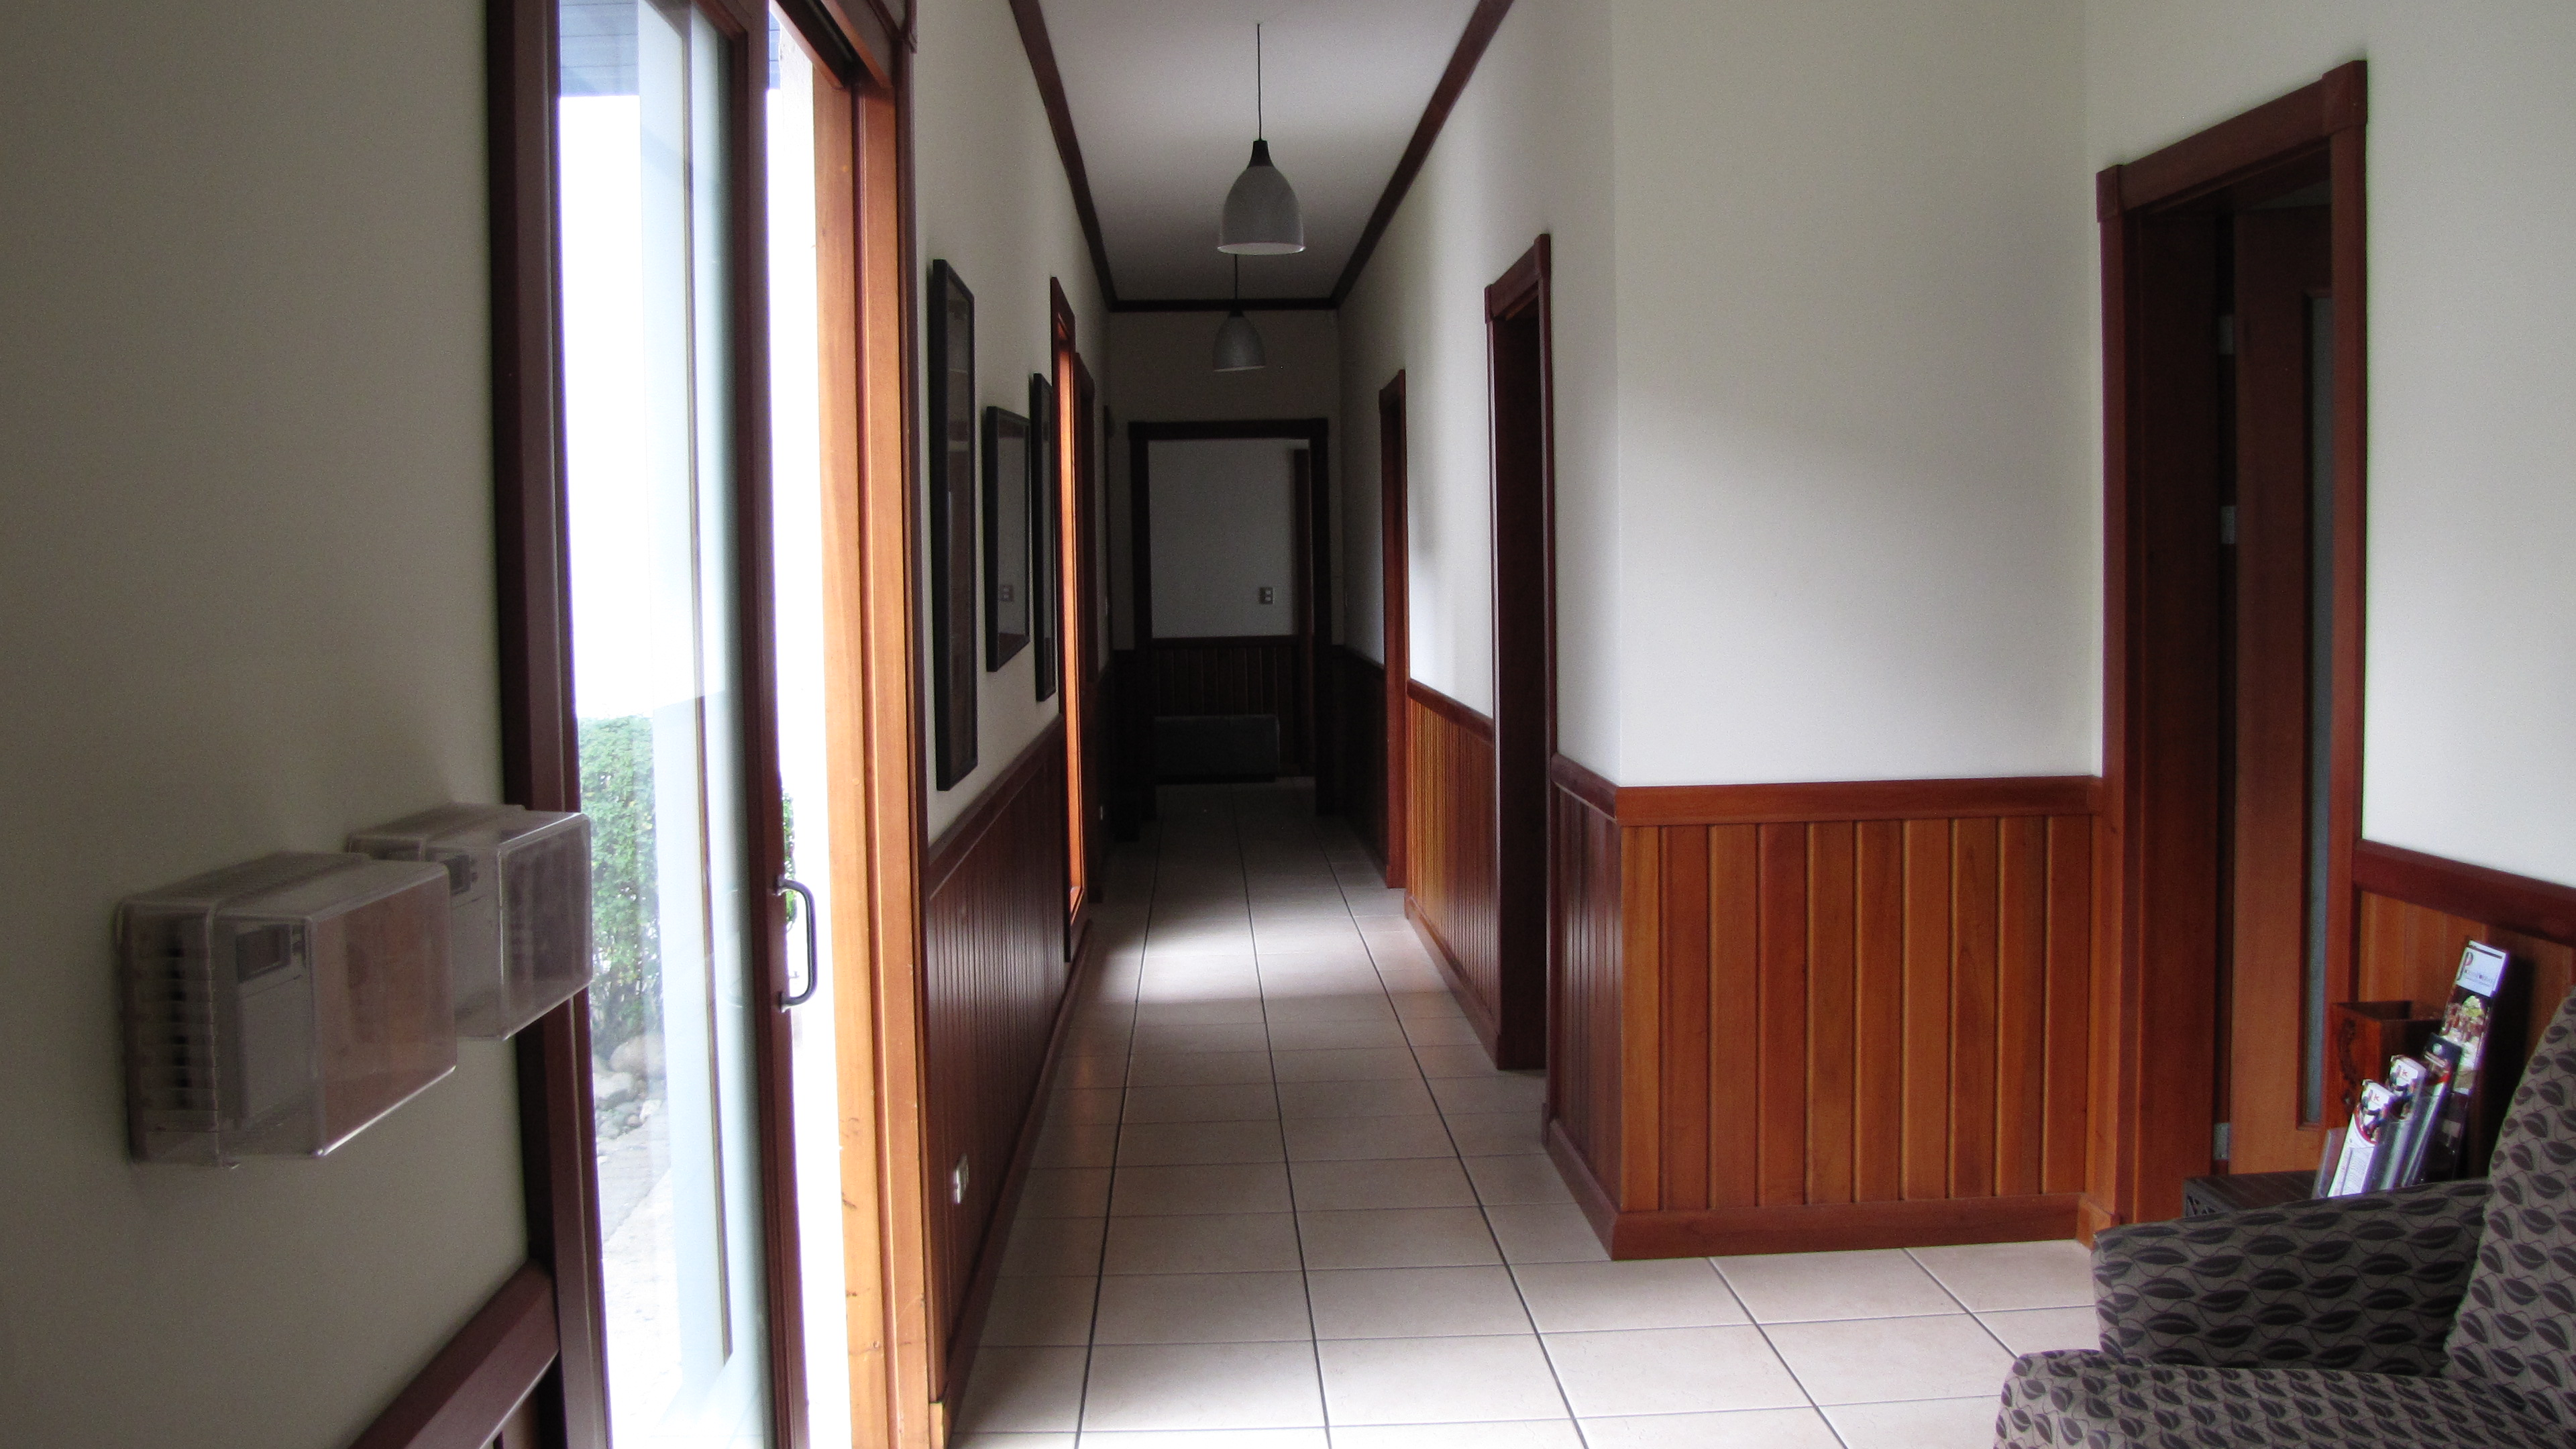 Amplios pasillos